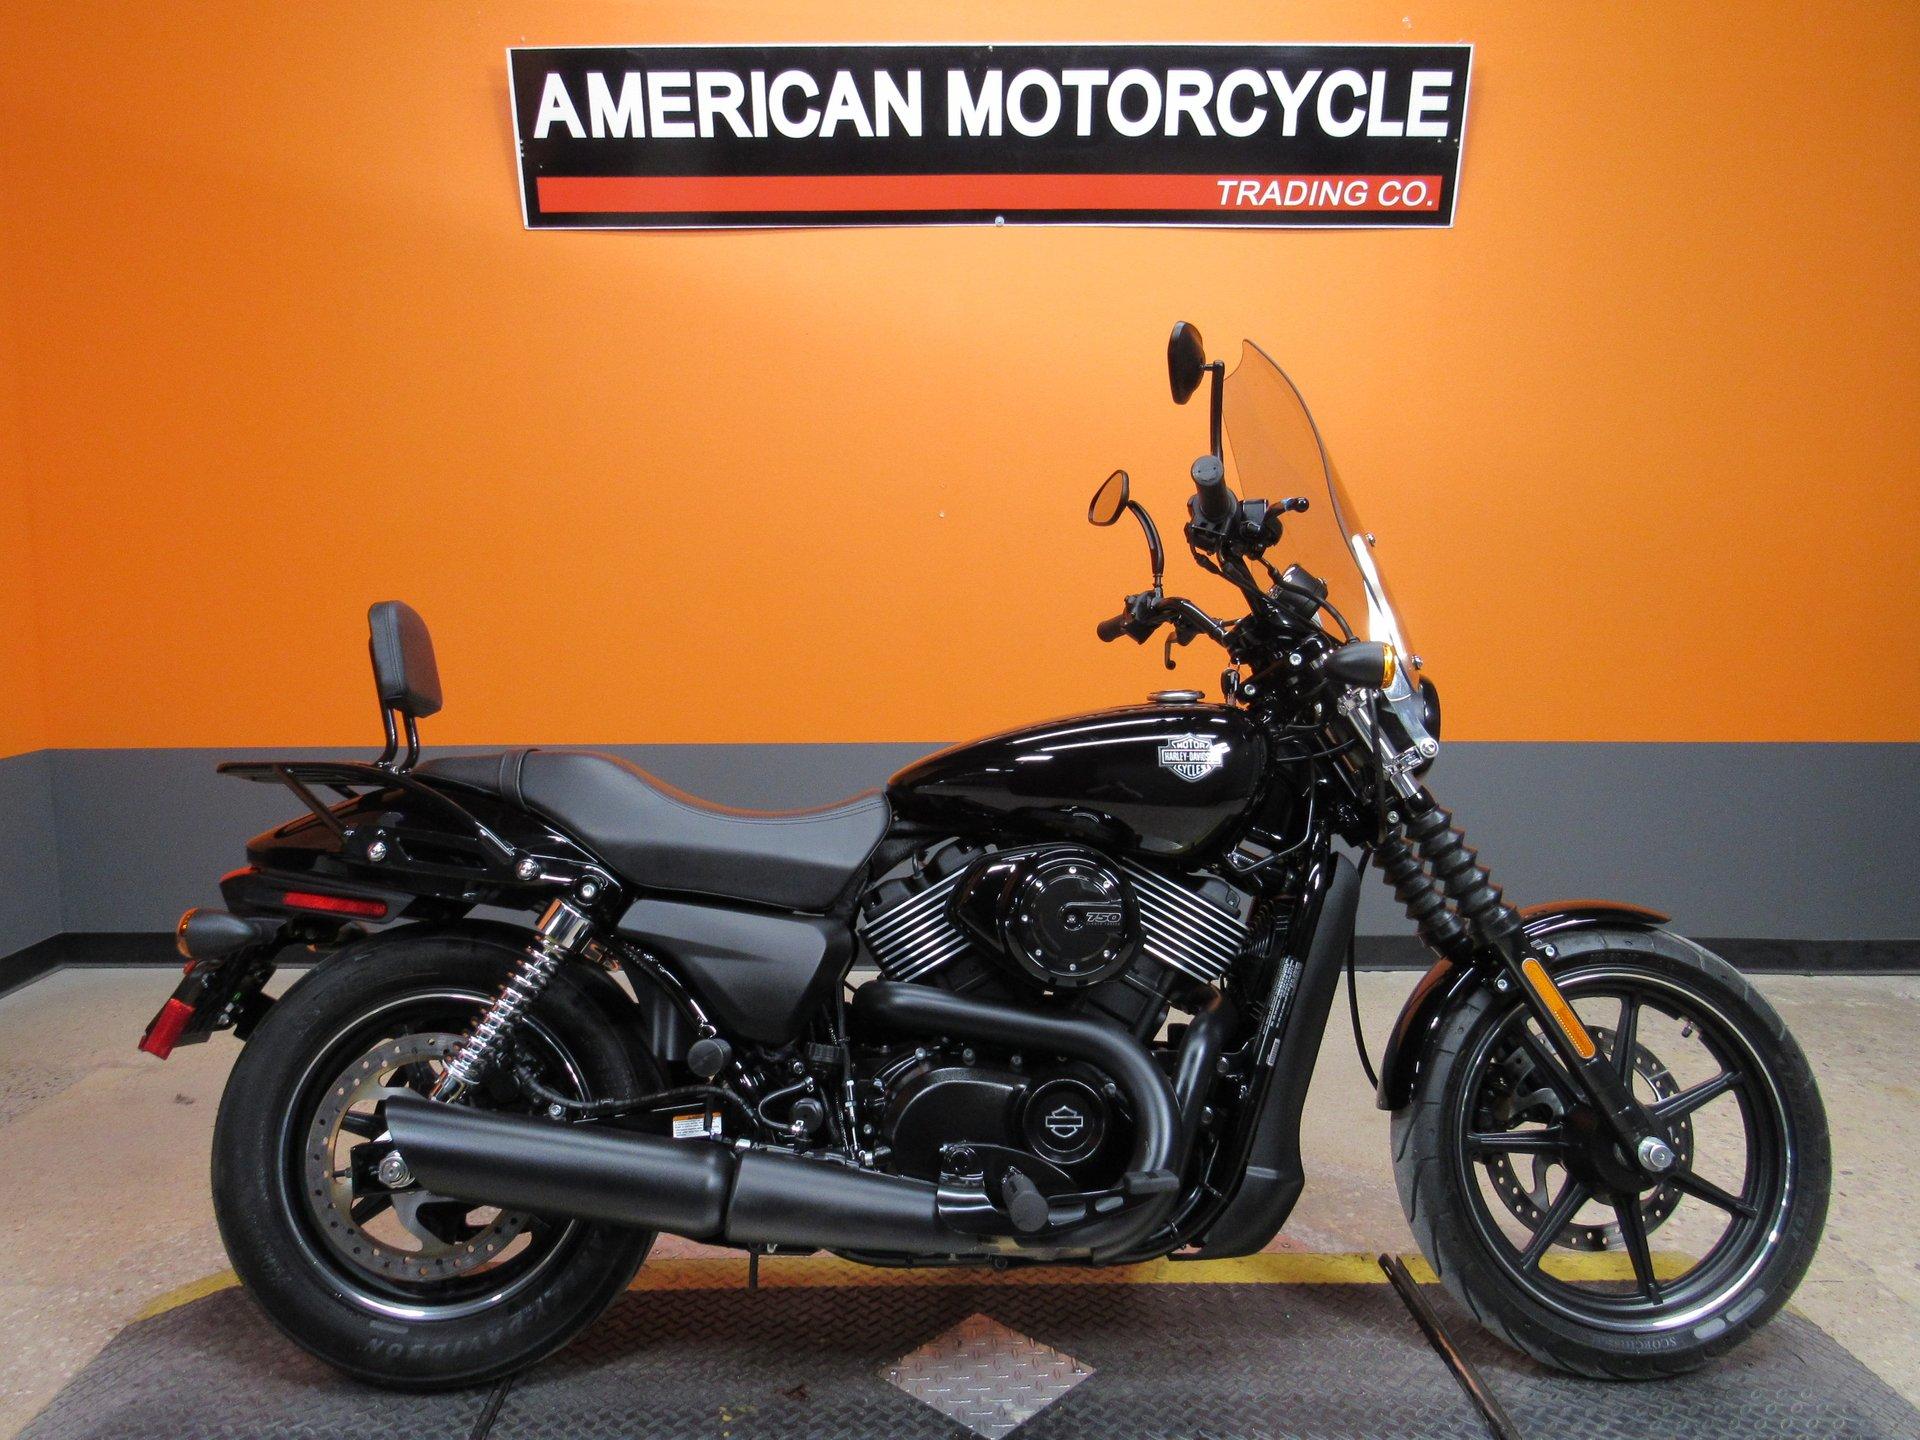 2017 Harley Davidson Street 750 American Motorcycle Trading Company Used Harley Davidson Motorcycles